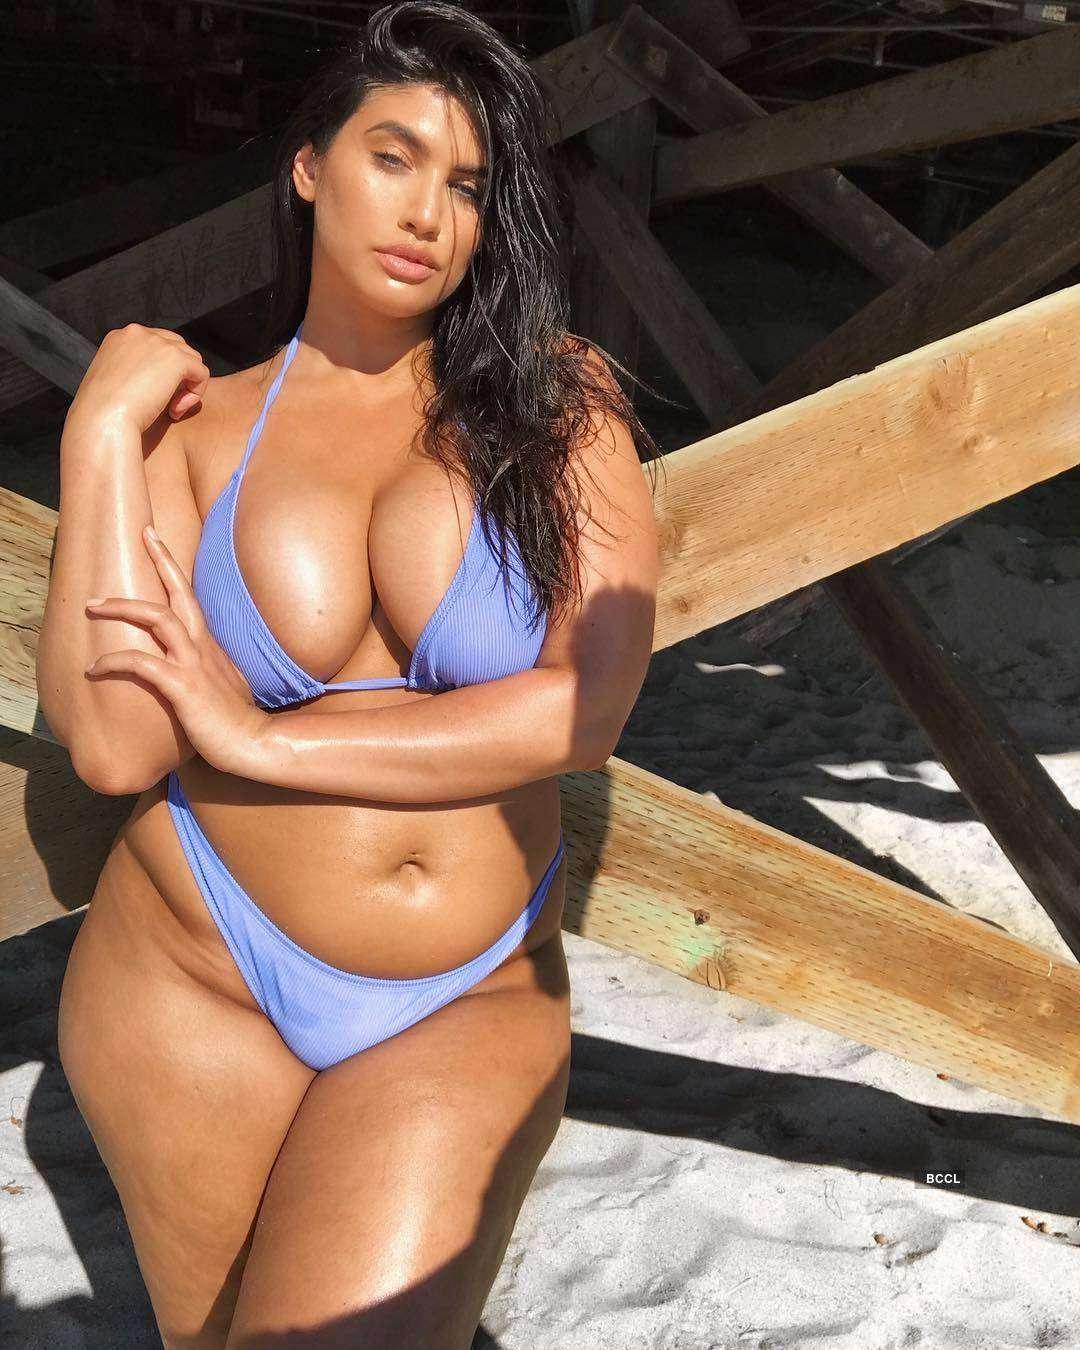 'Curves be like La'Tecia,' inspiring story of a plus-size model...